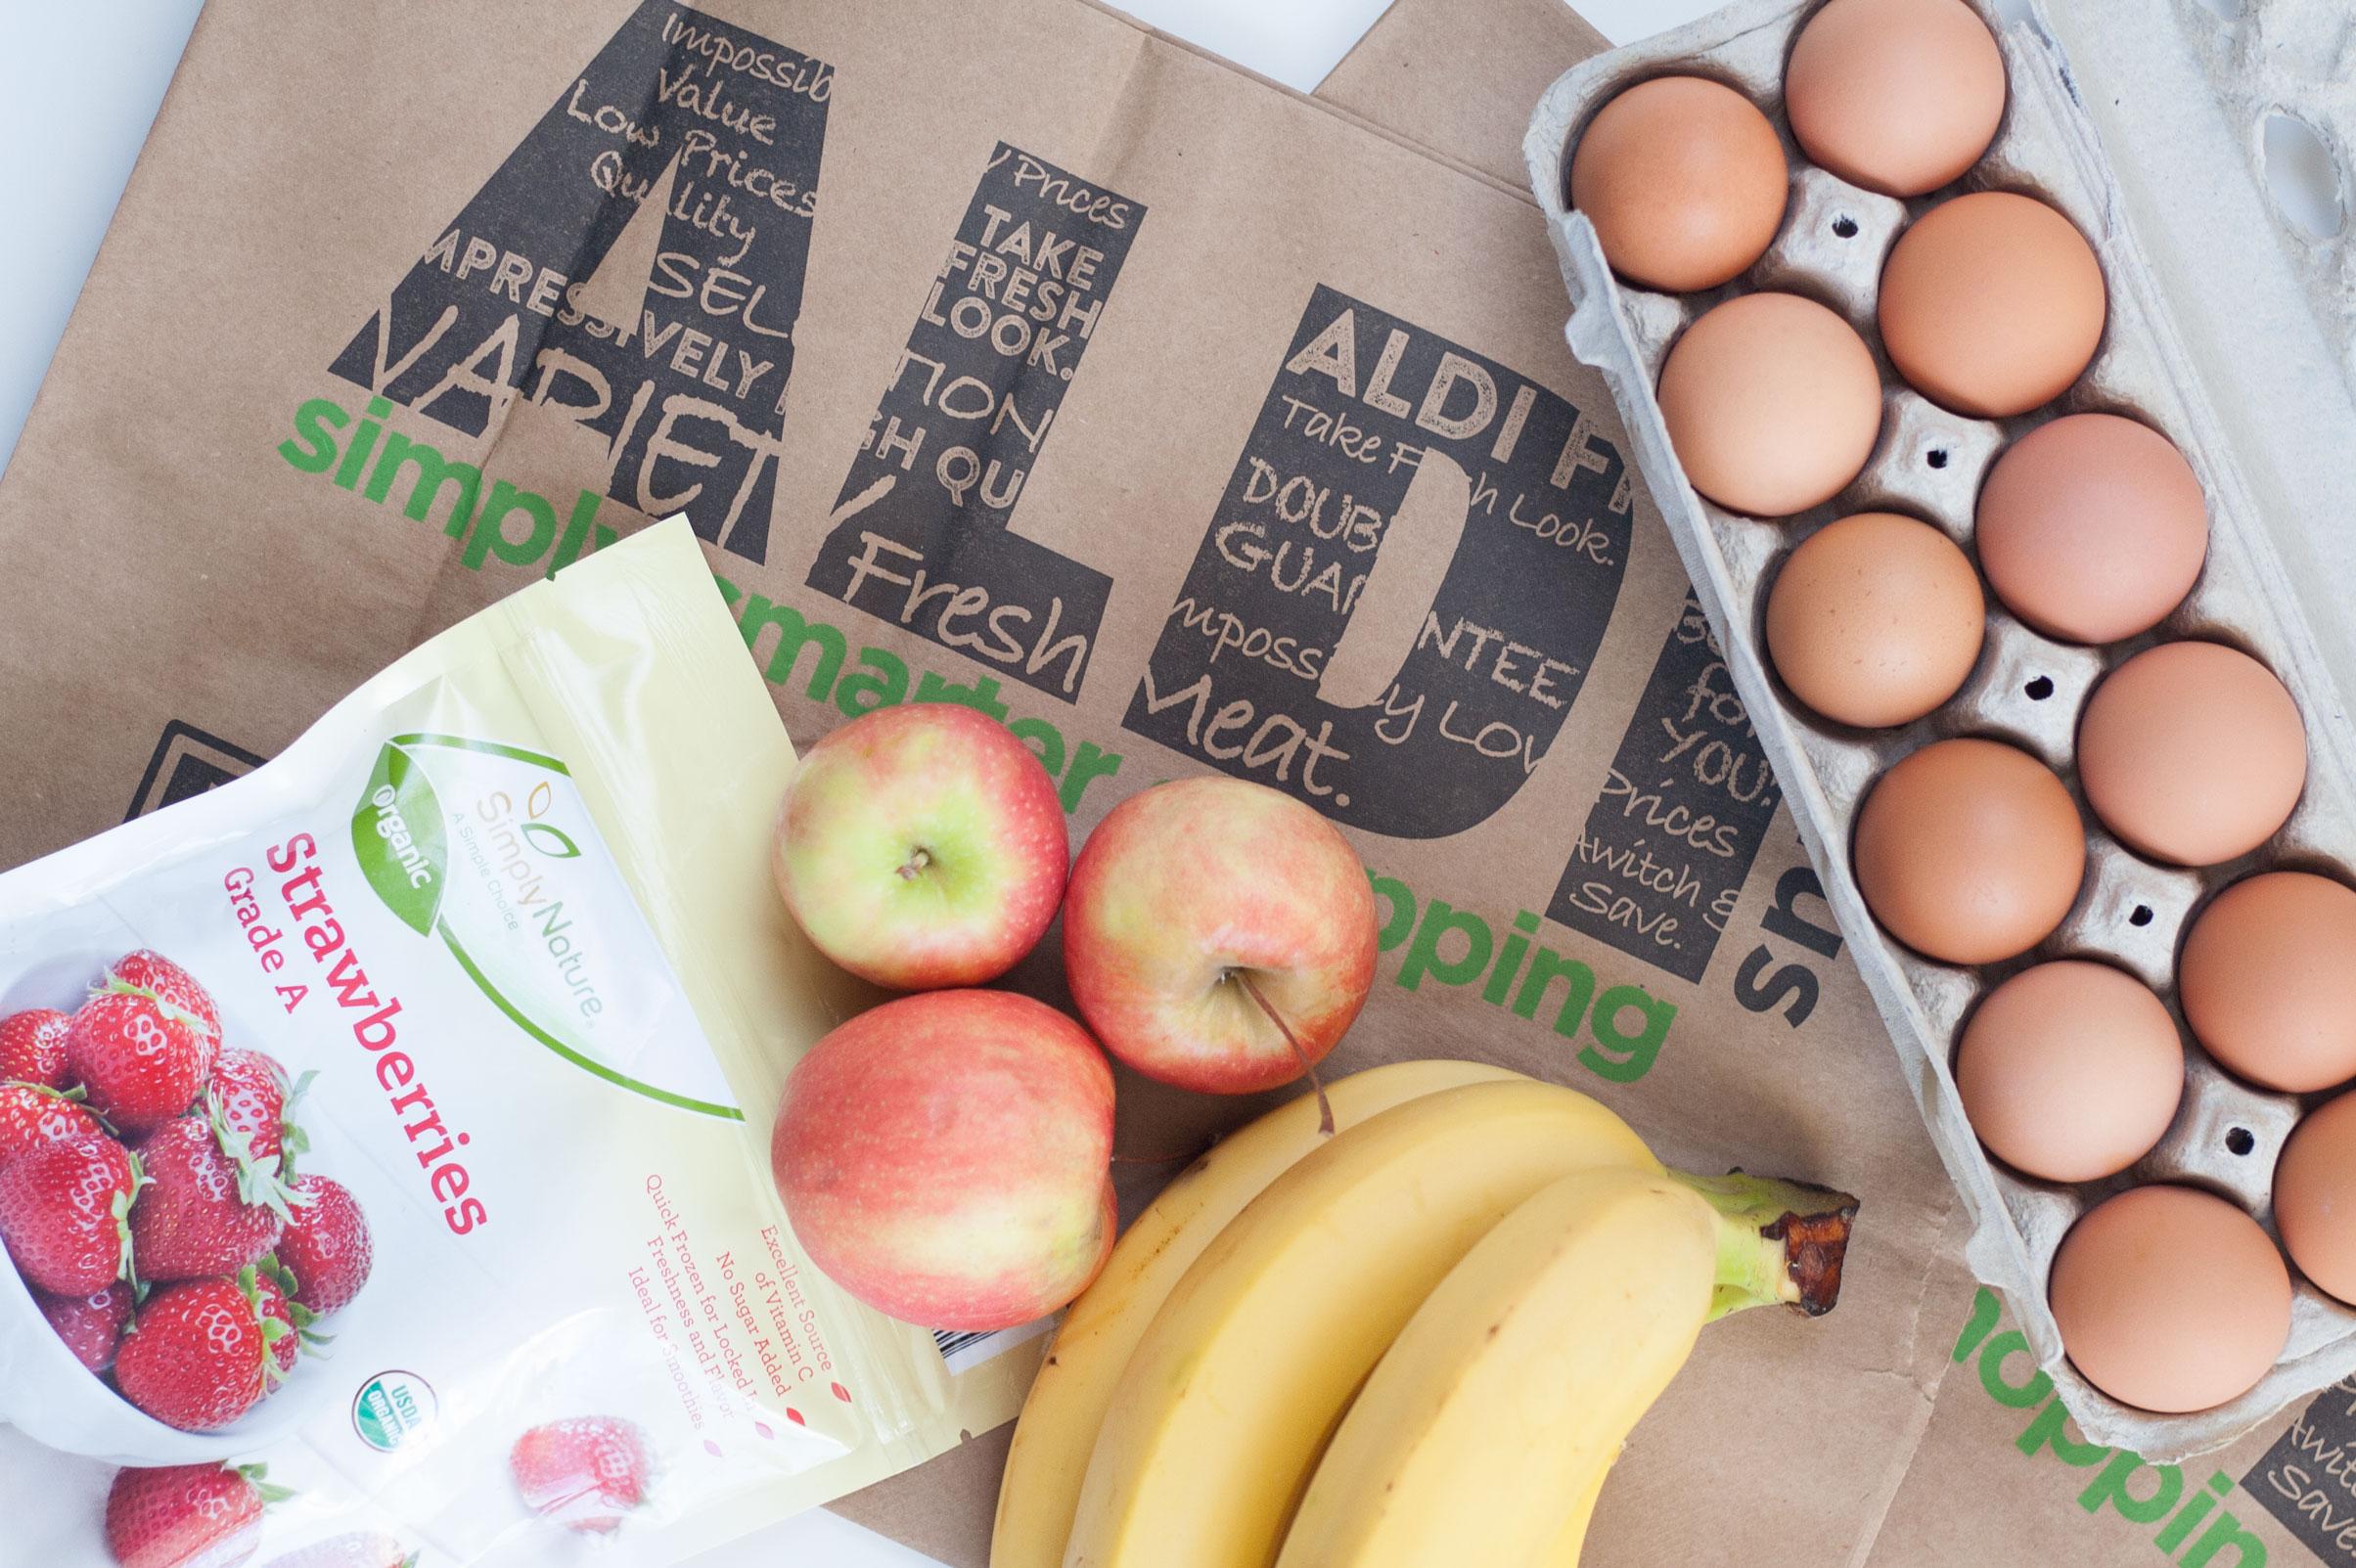 affordable organic grocery food ingredients aldi